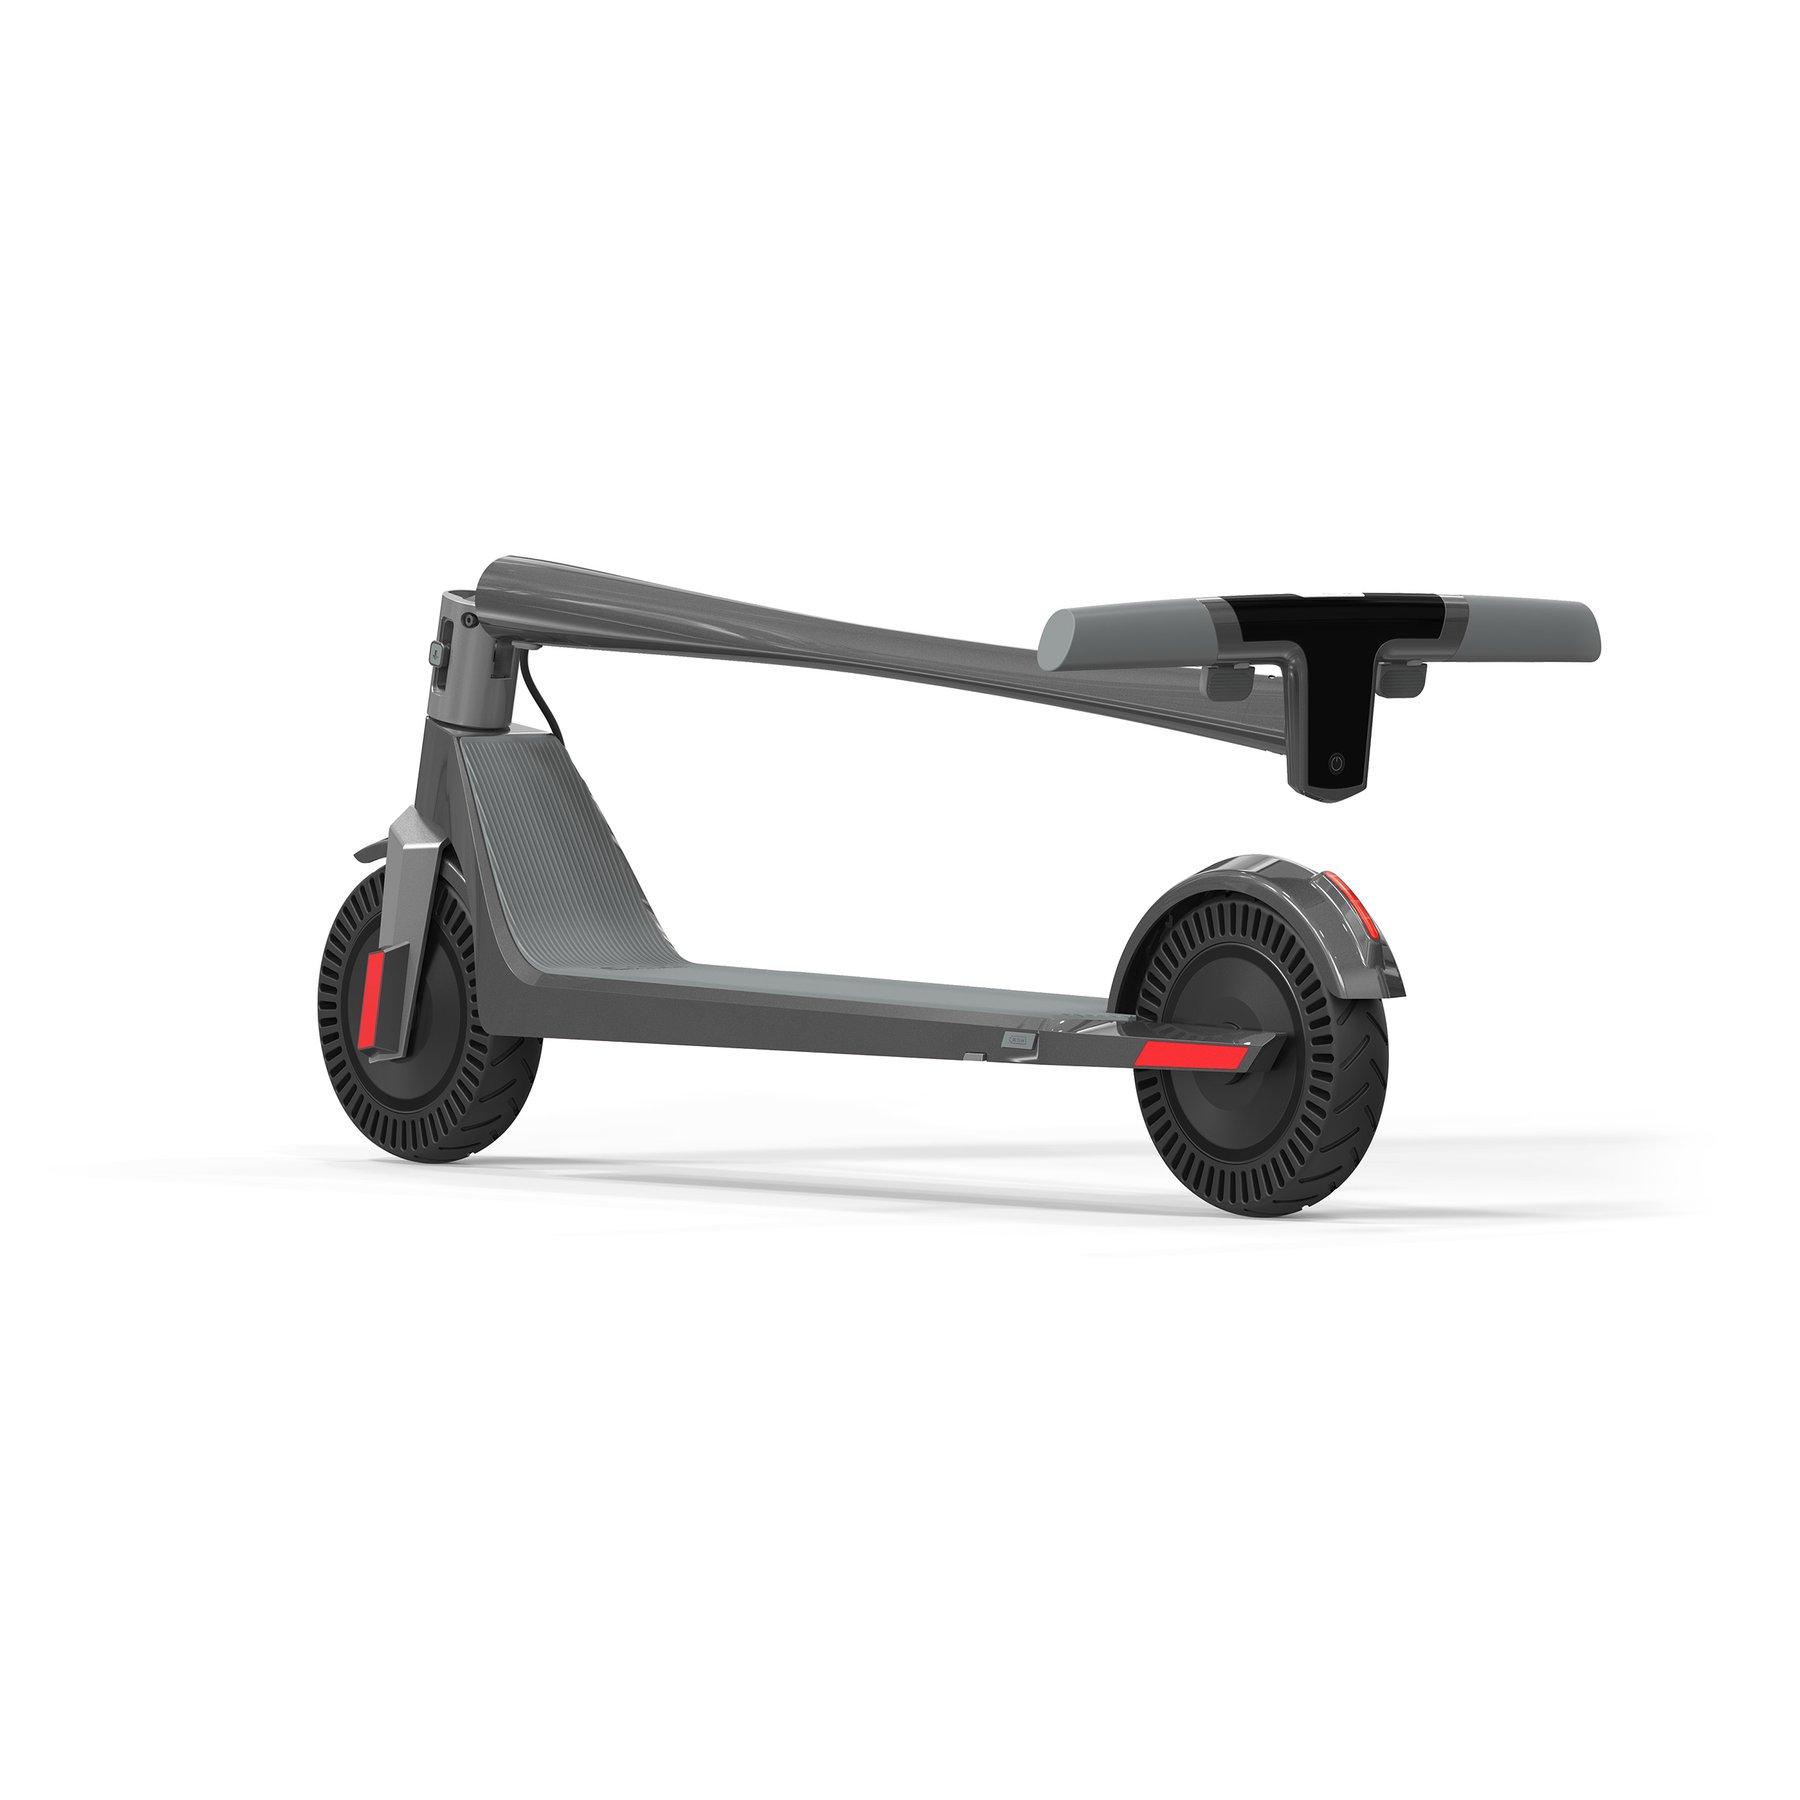 scooter_gotham_019_1800x1800.jpg